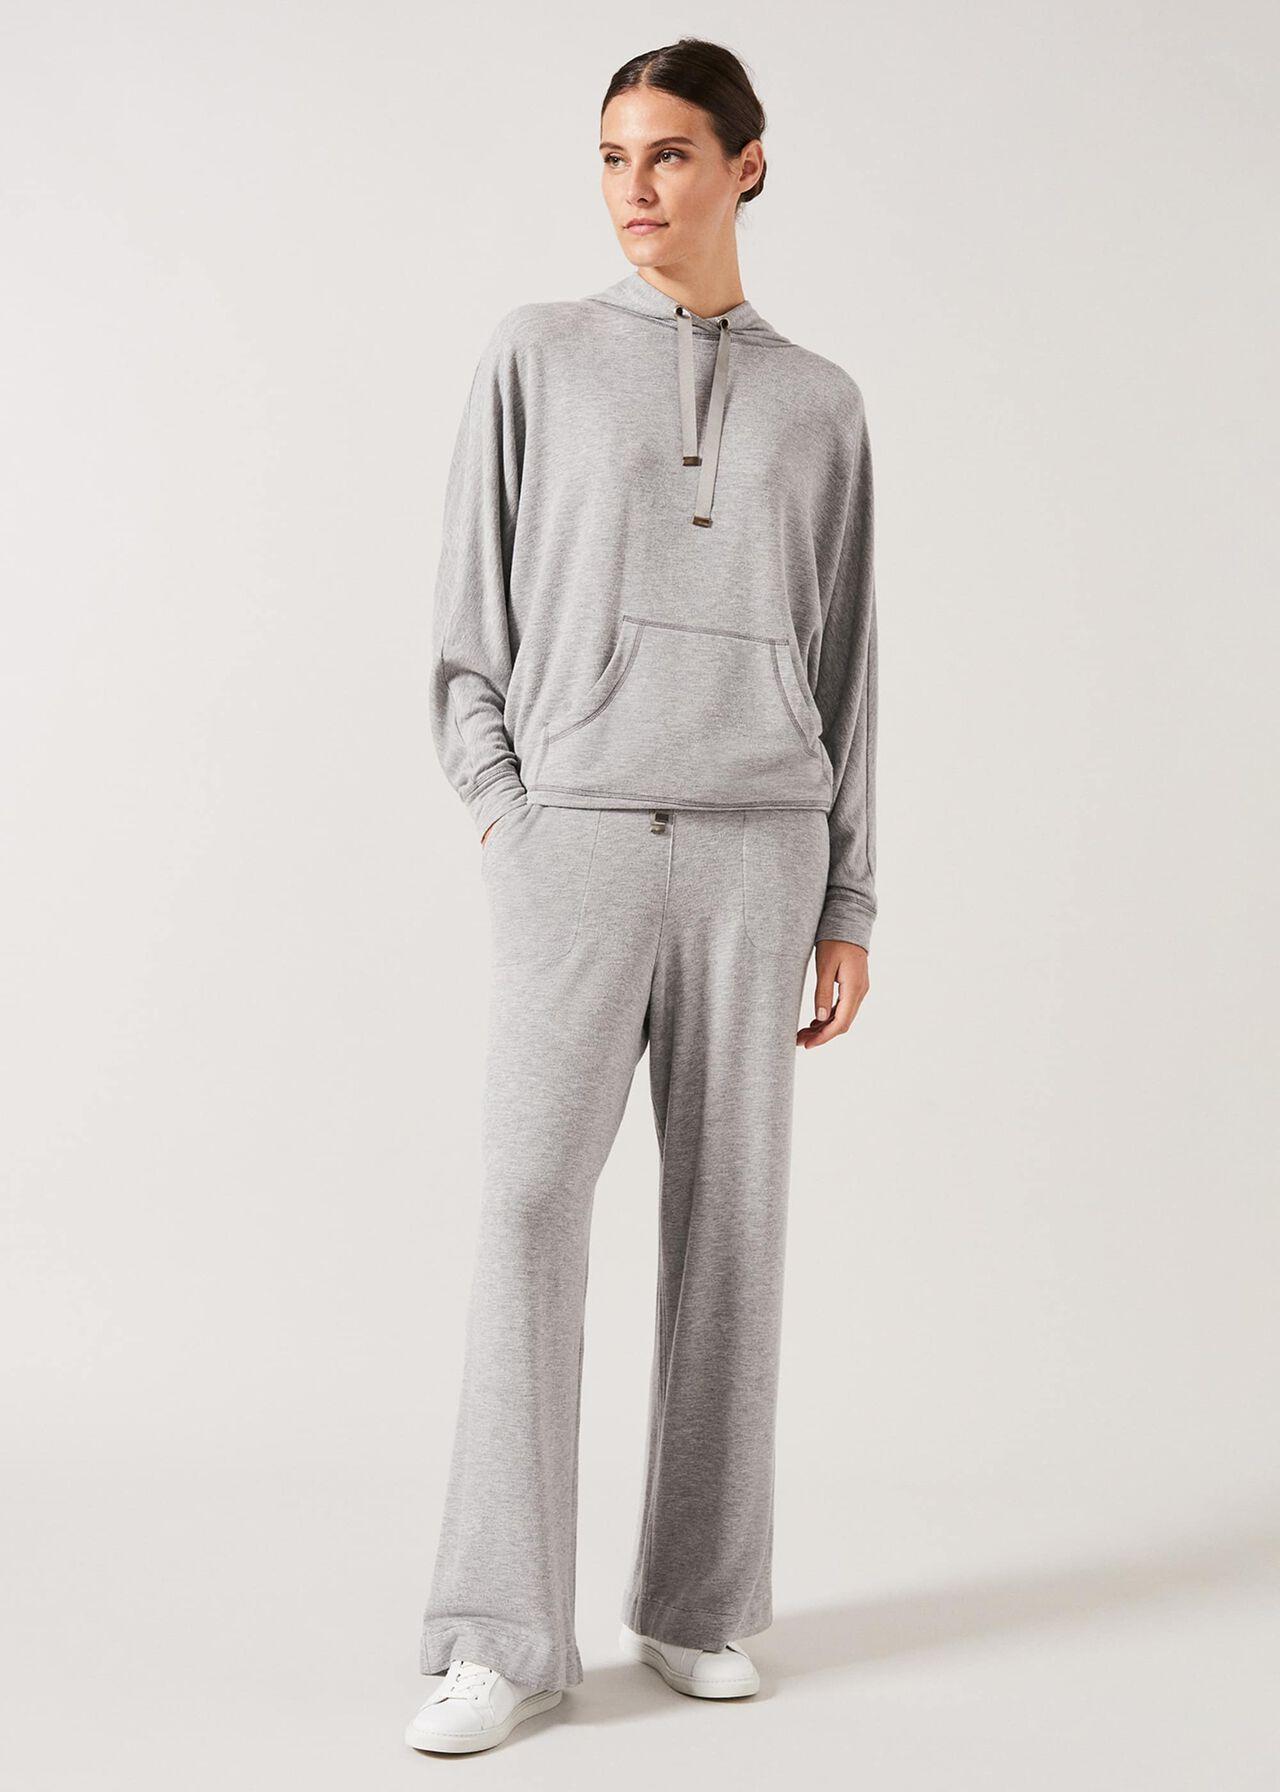 Loungewear Joggers